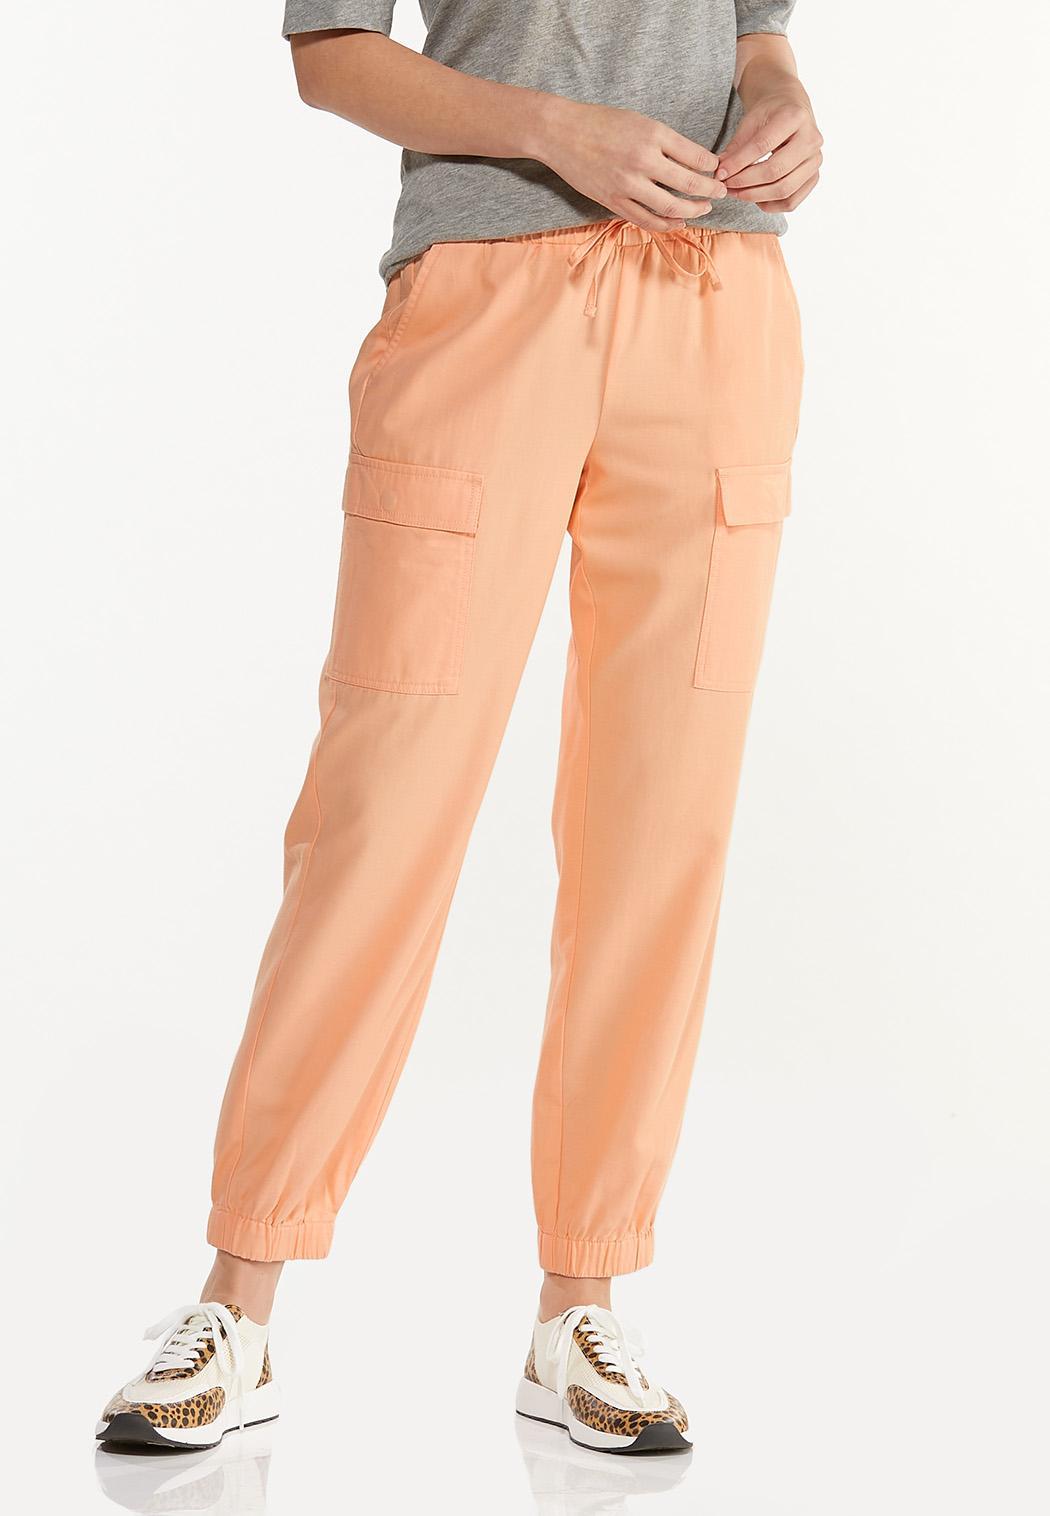 Sweet Tangerine Utility Joggers